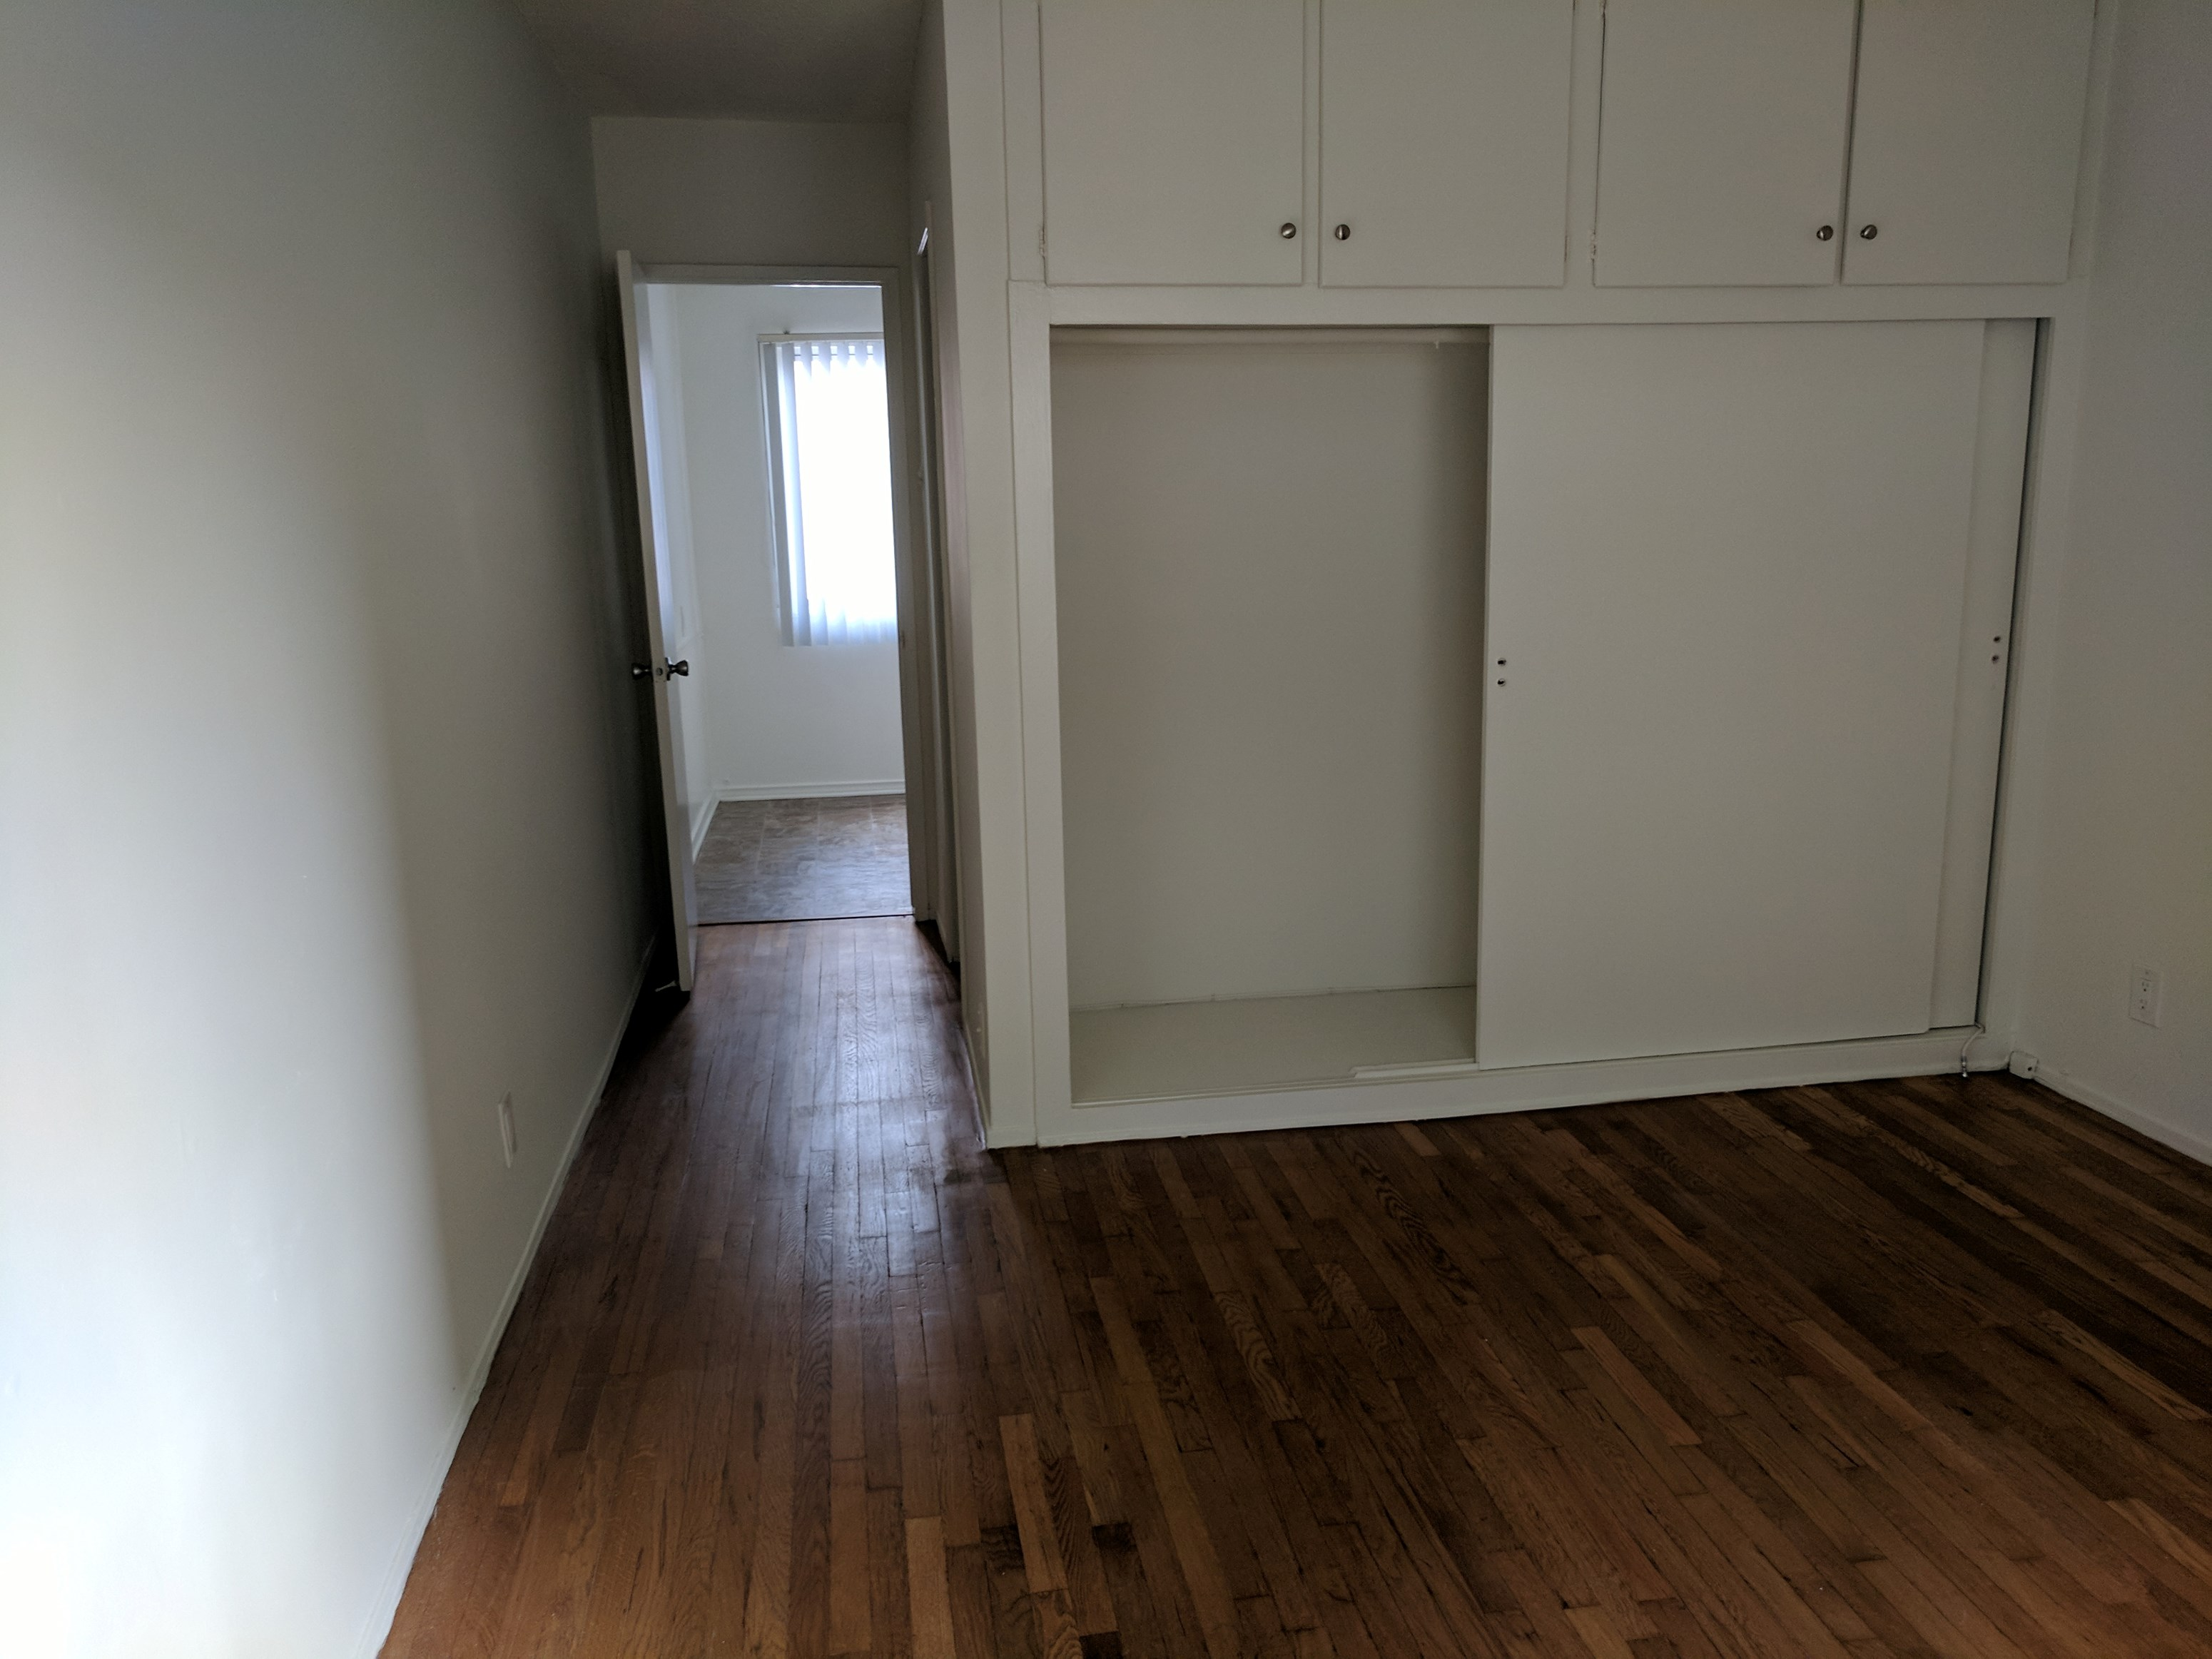 Tustin CA Orange County Apartment For Sublease